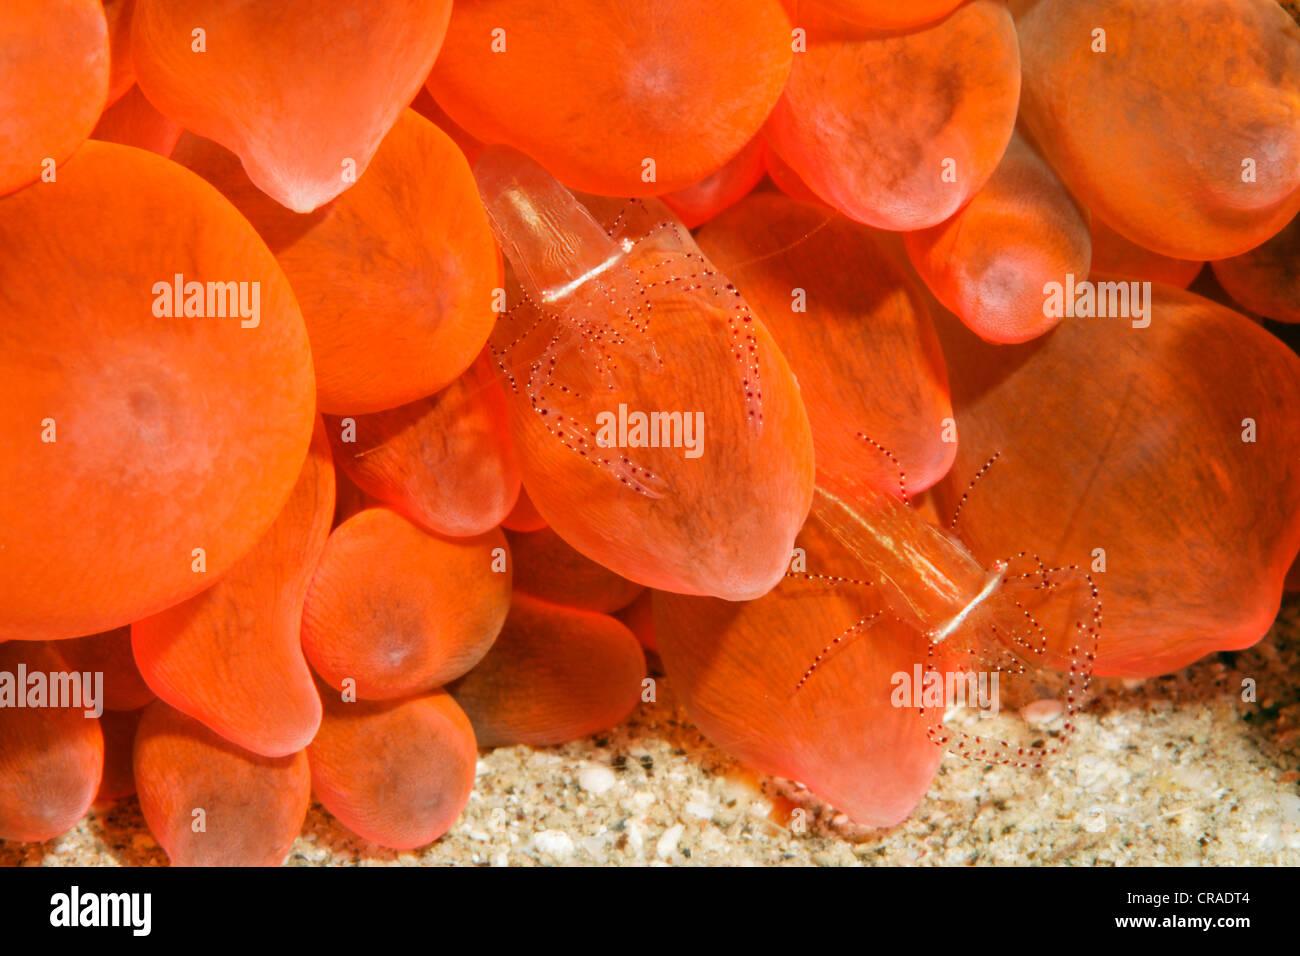 Pair of Anemone Shrimps (Periclimenes ornatus) in red sea anemone, Hashemite Kingdom of Jordan, JK, Red Sea, Western - Stock Image